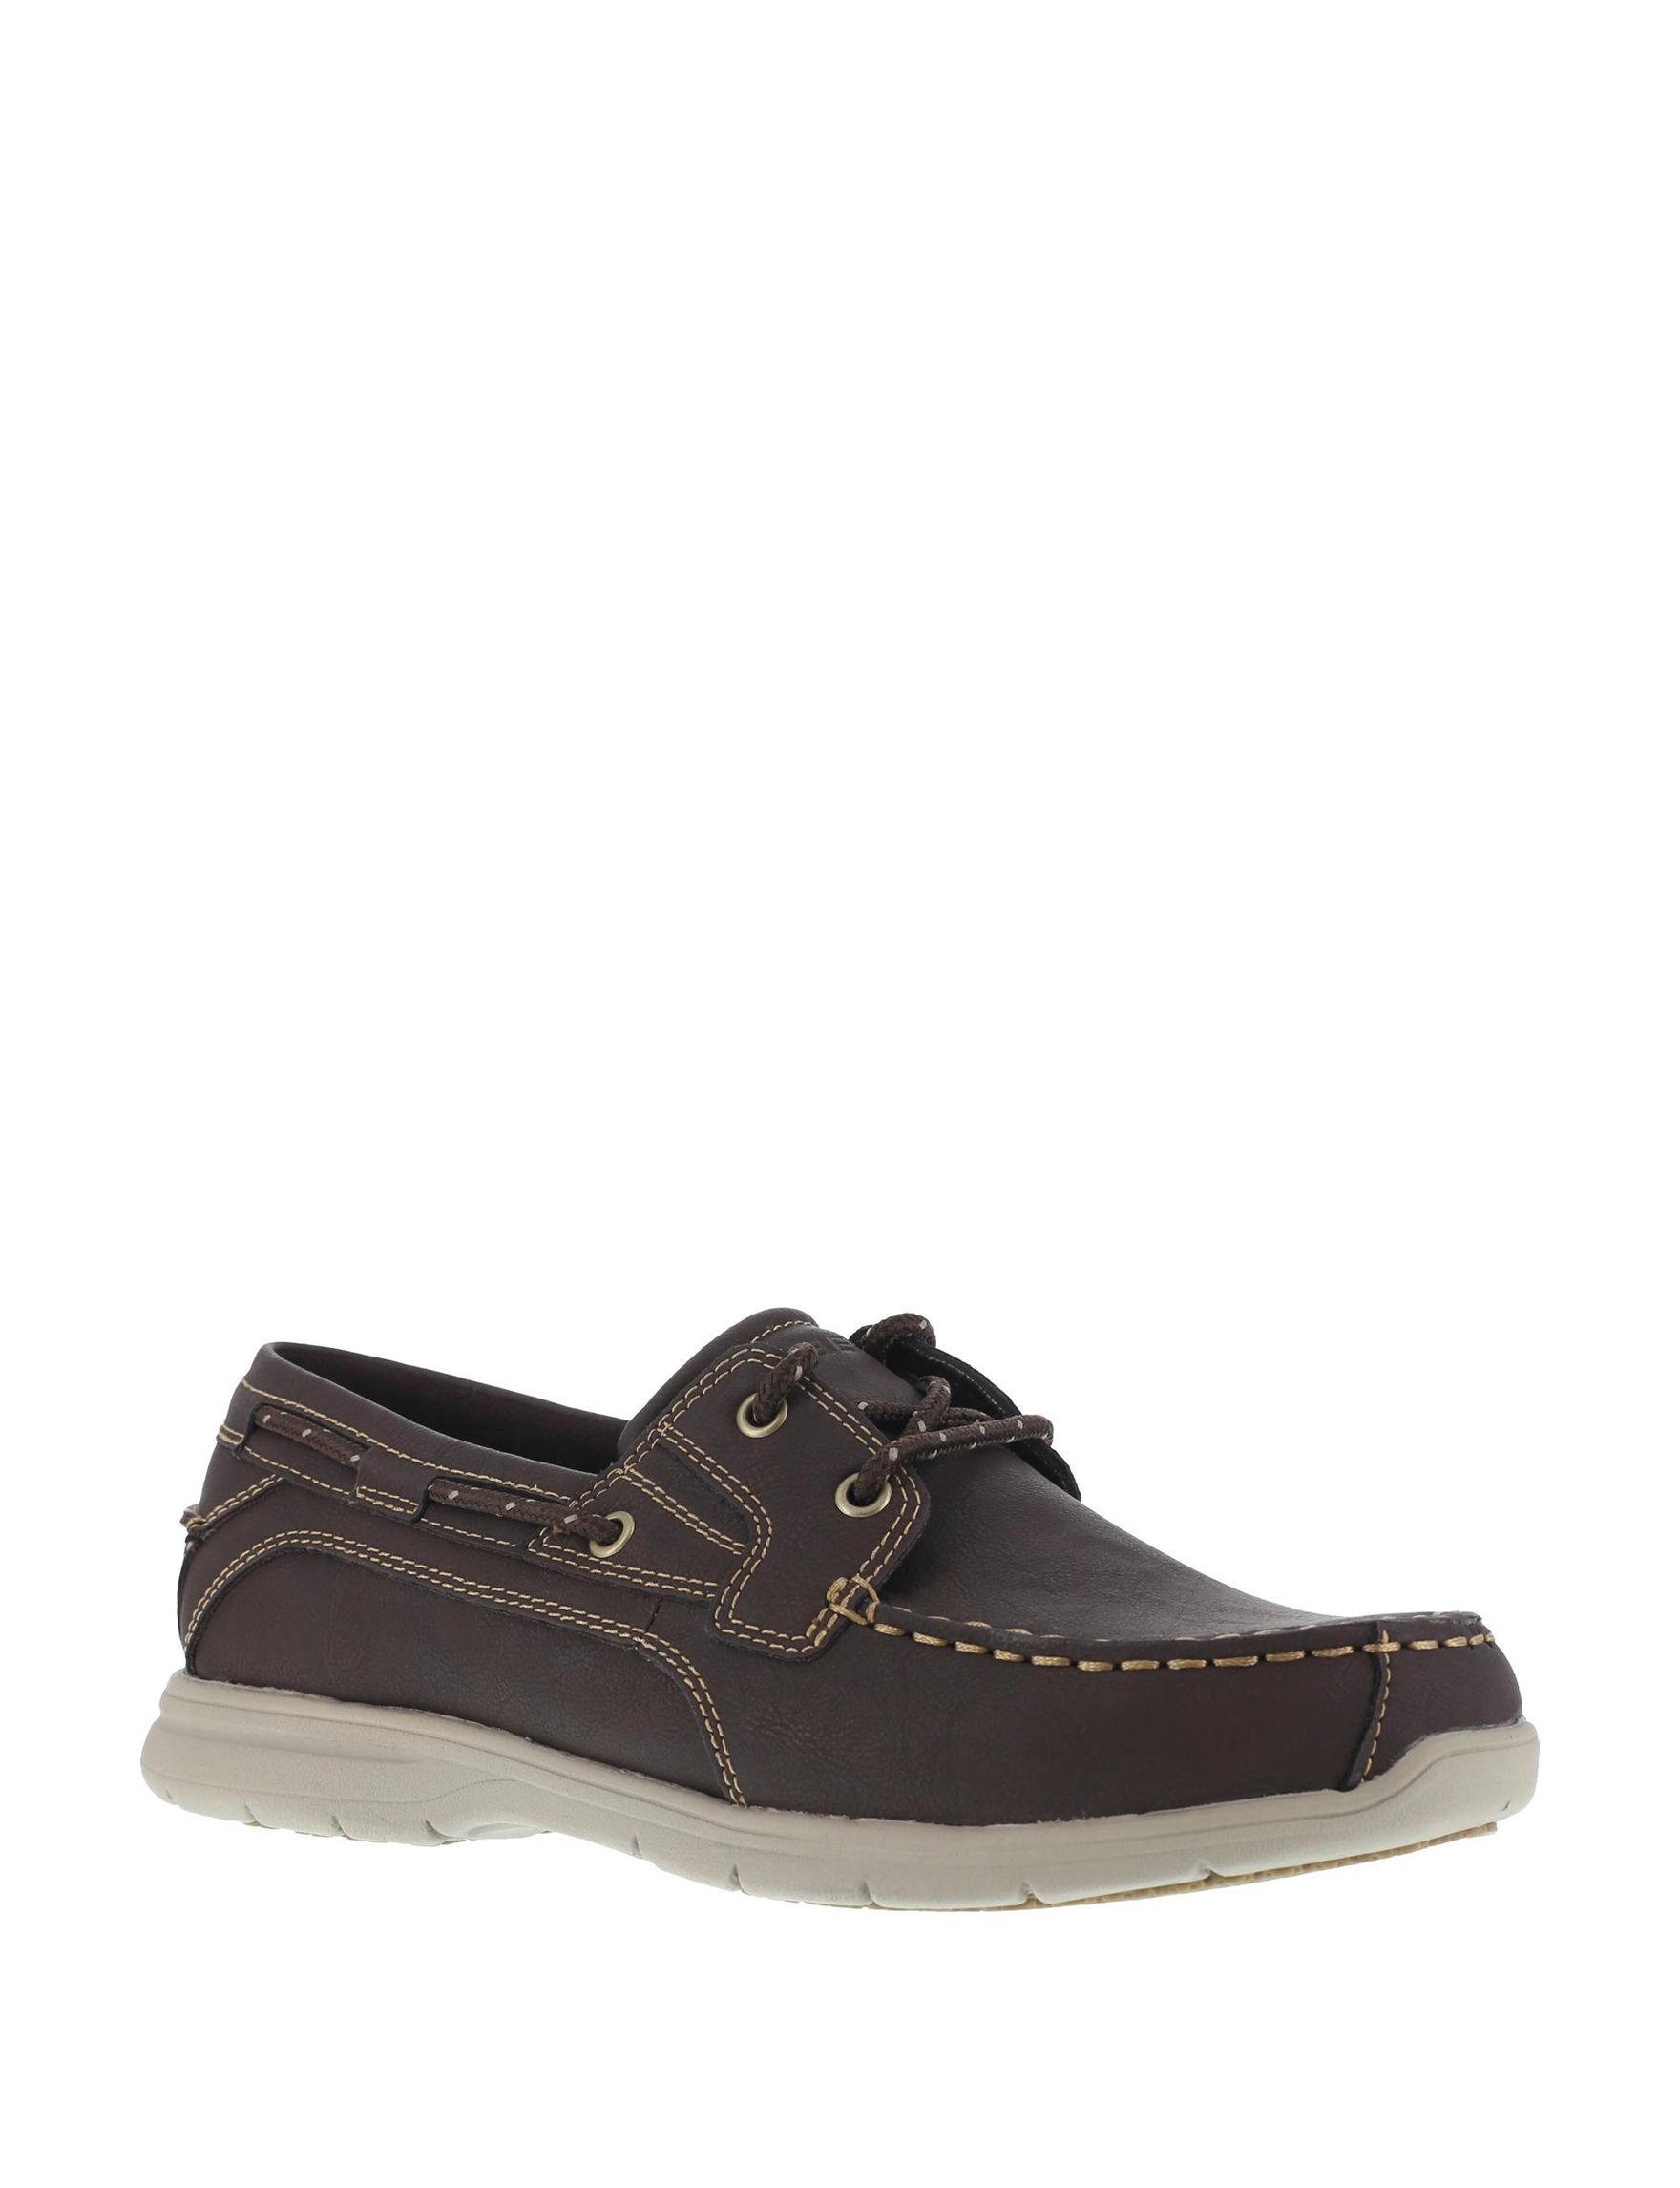 Grabbers Brown Slip Resistant